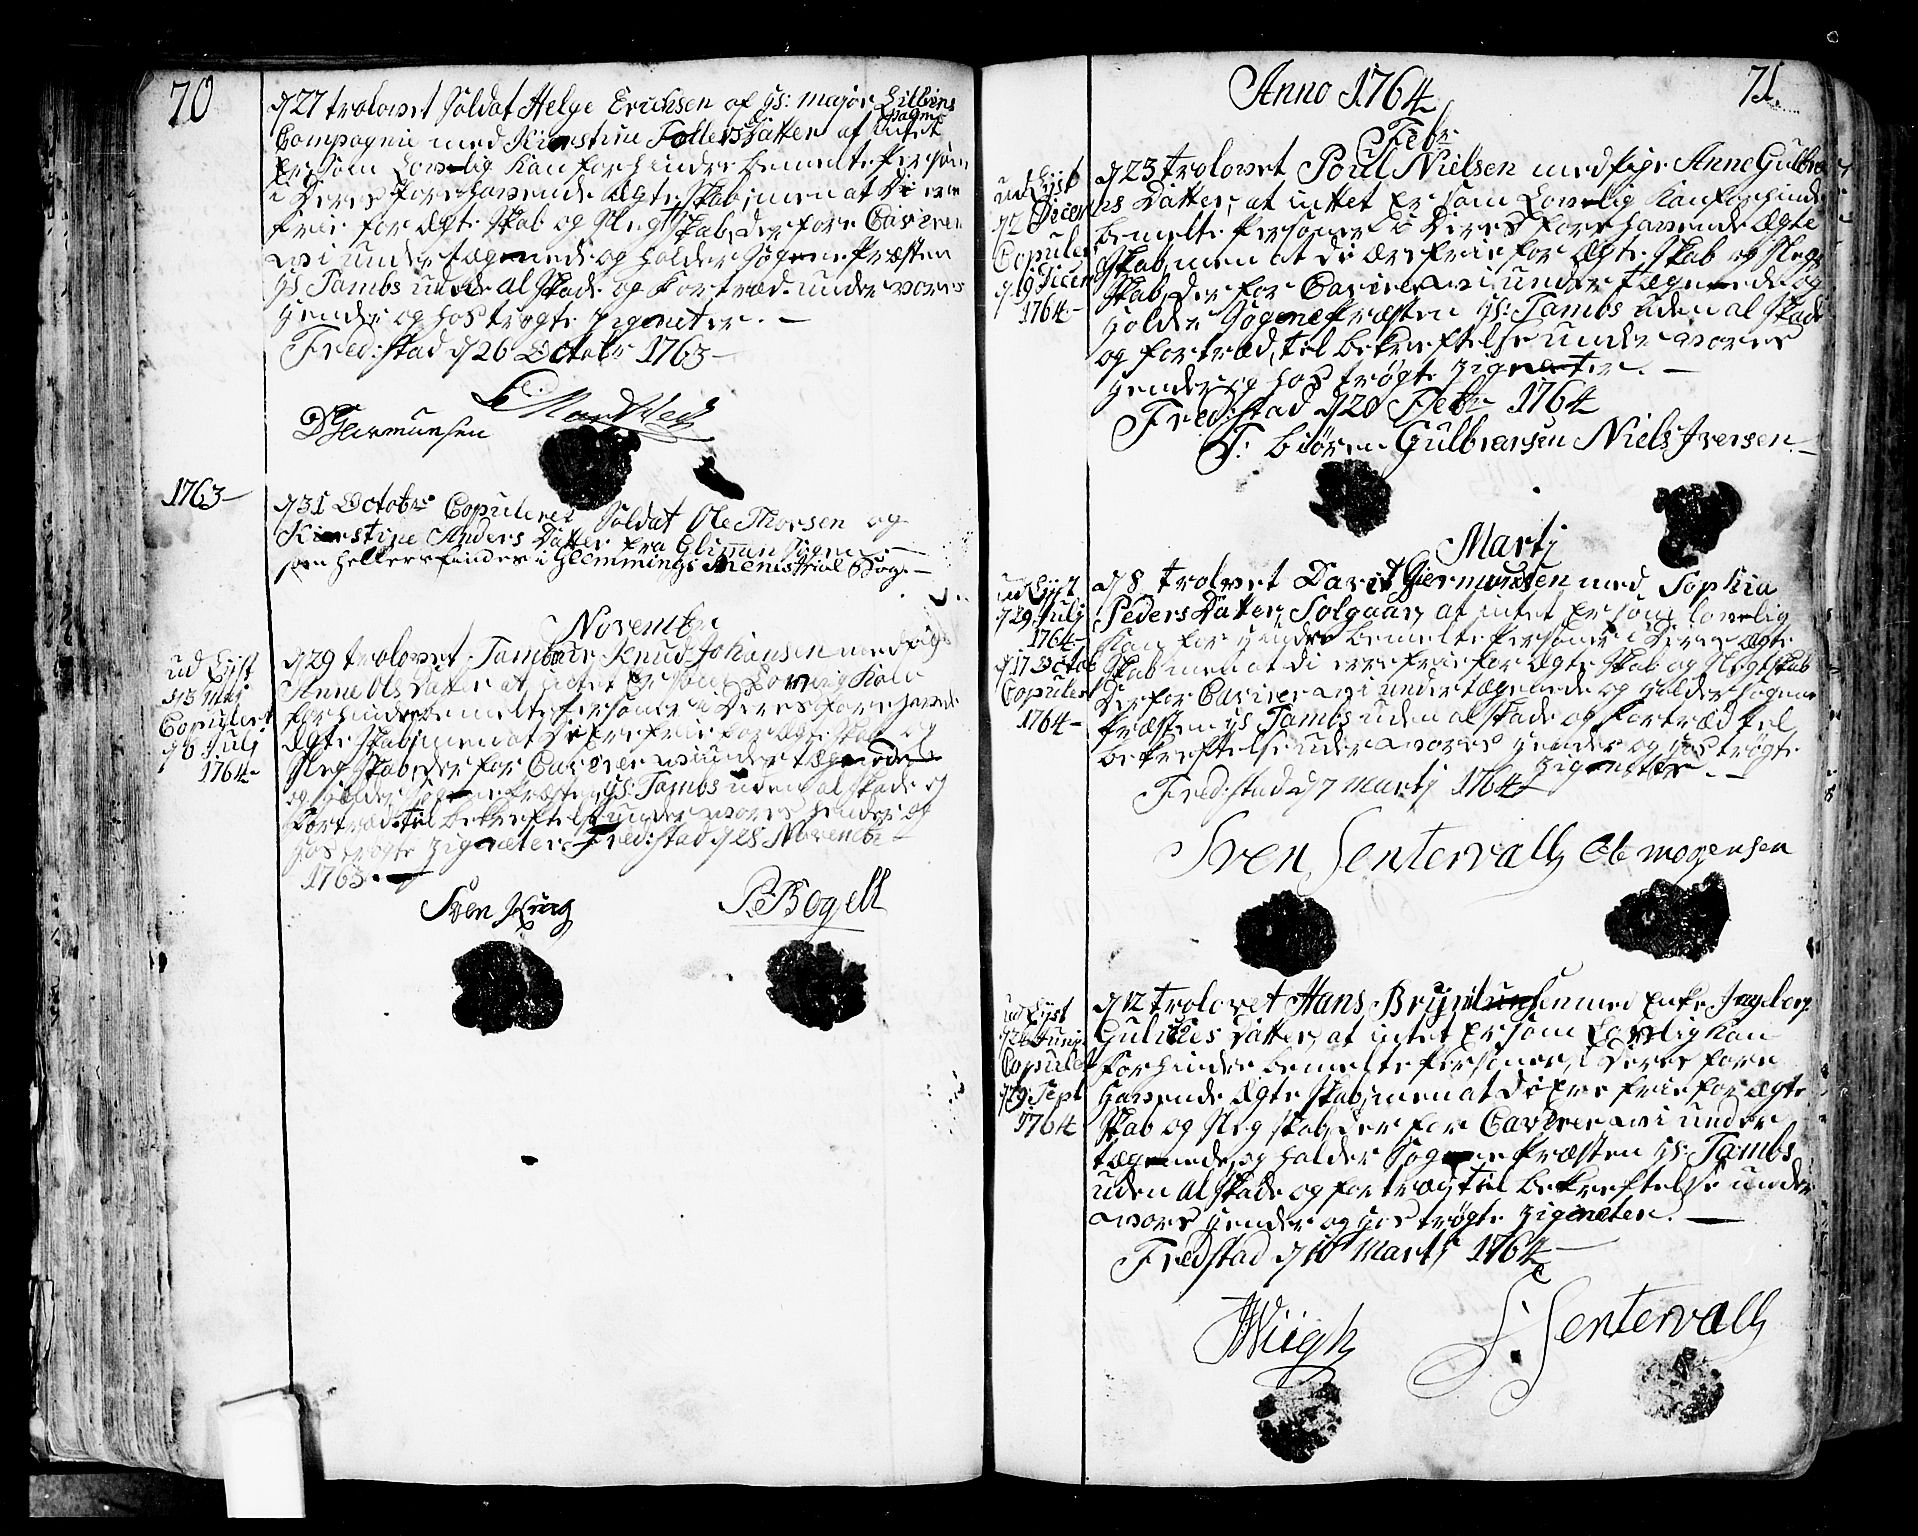 SAO, Fredrikstad prestekontor Kirkebøker, F/Fa/L0002: Ministerialbok nr. 2, 1750-1804, s. 70-71